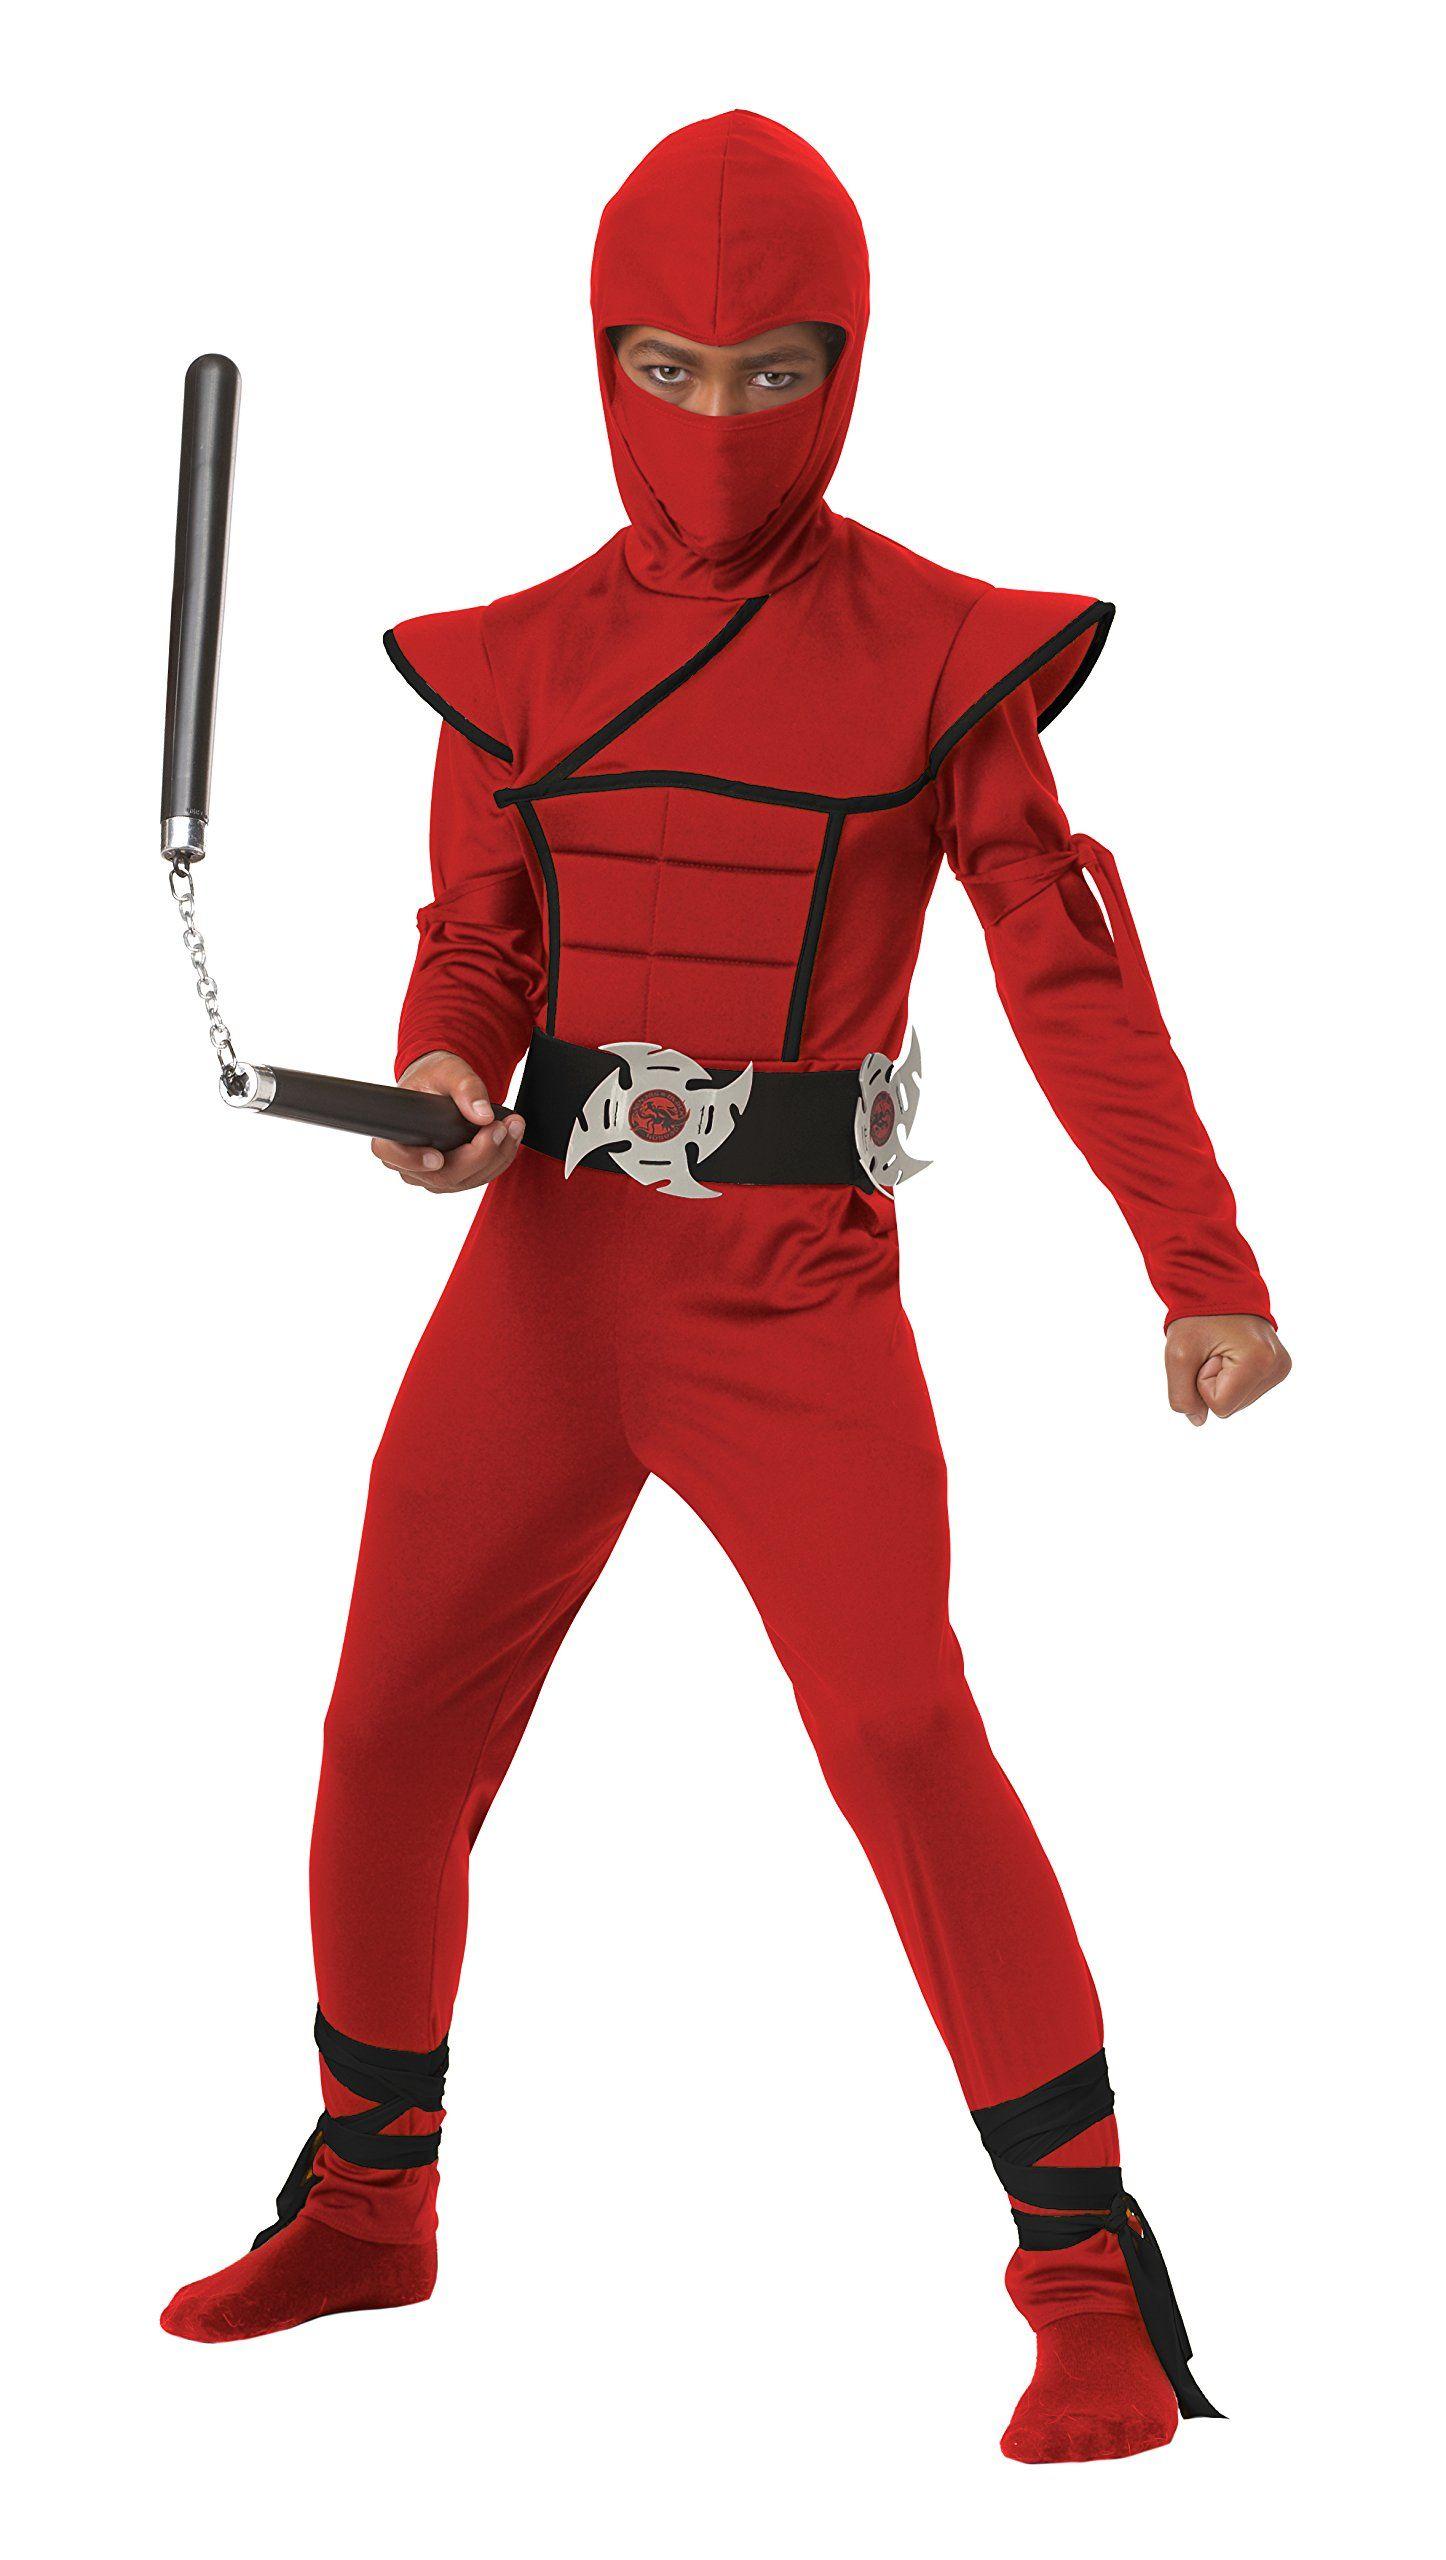 Boys Power Ninja Japanese Samurai Warrior Kids Child Fancy Dress Outfit Age 4-13